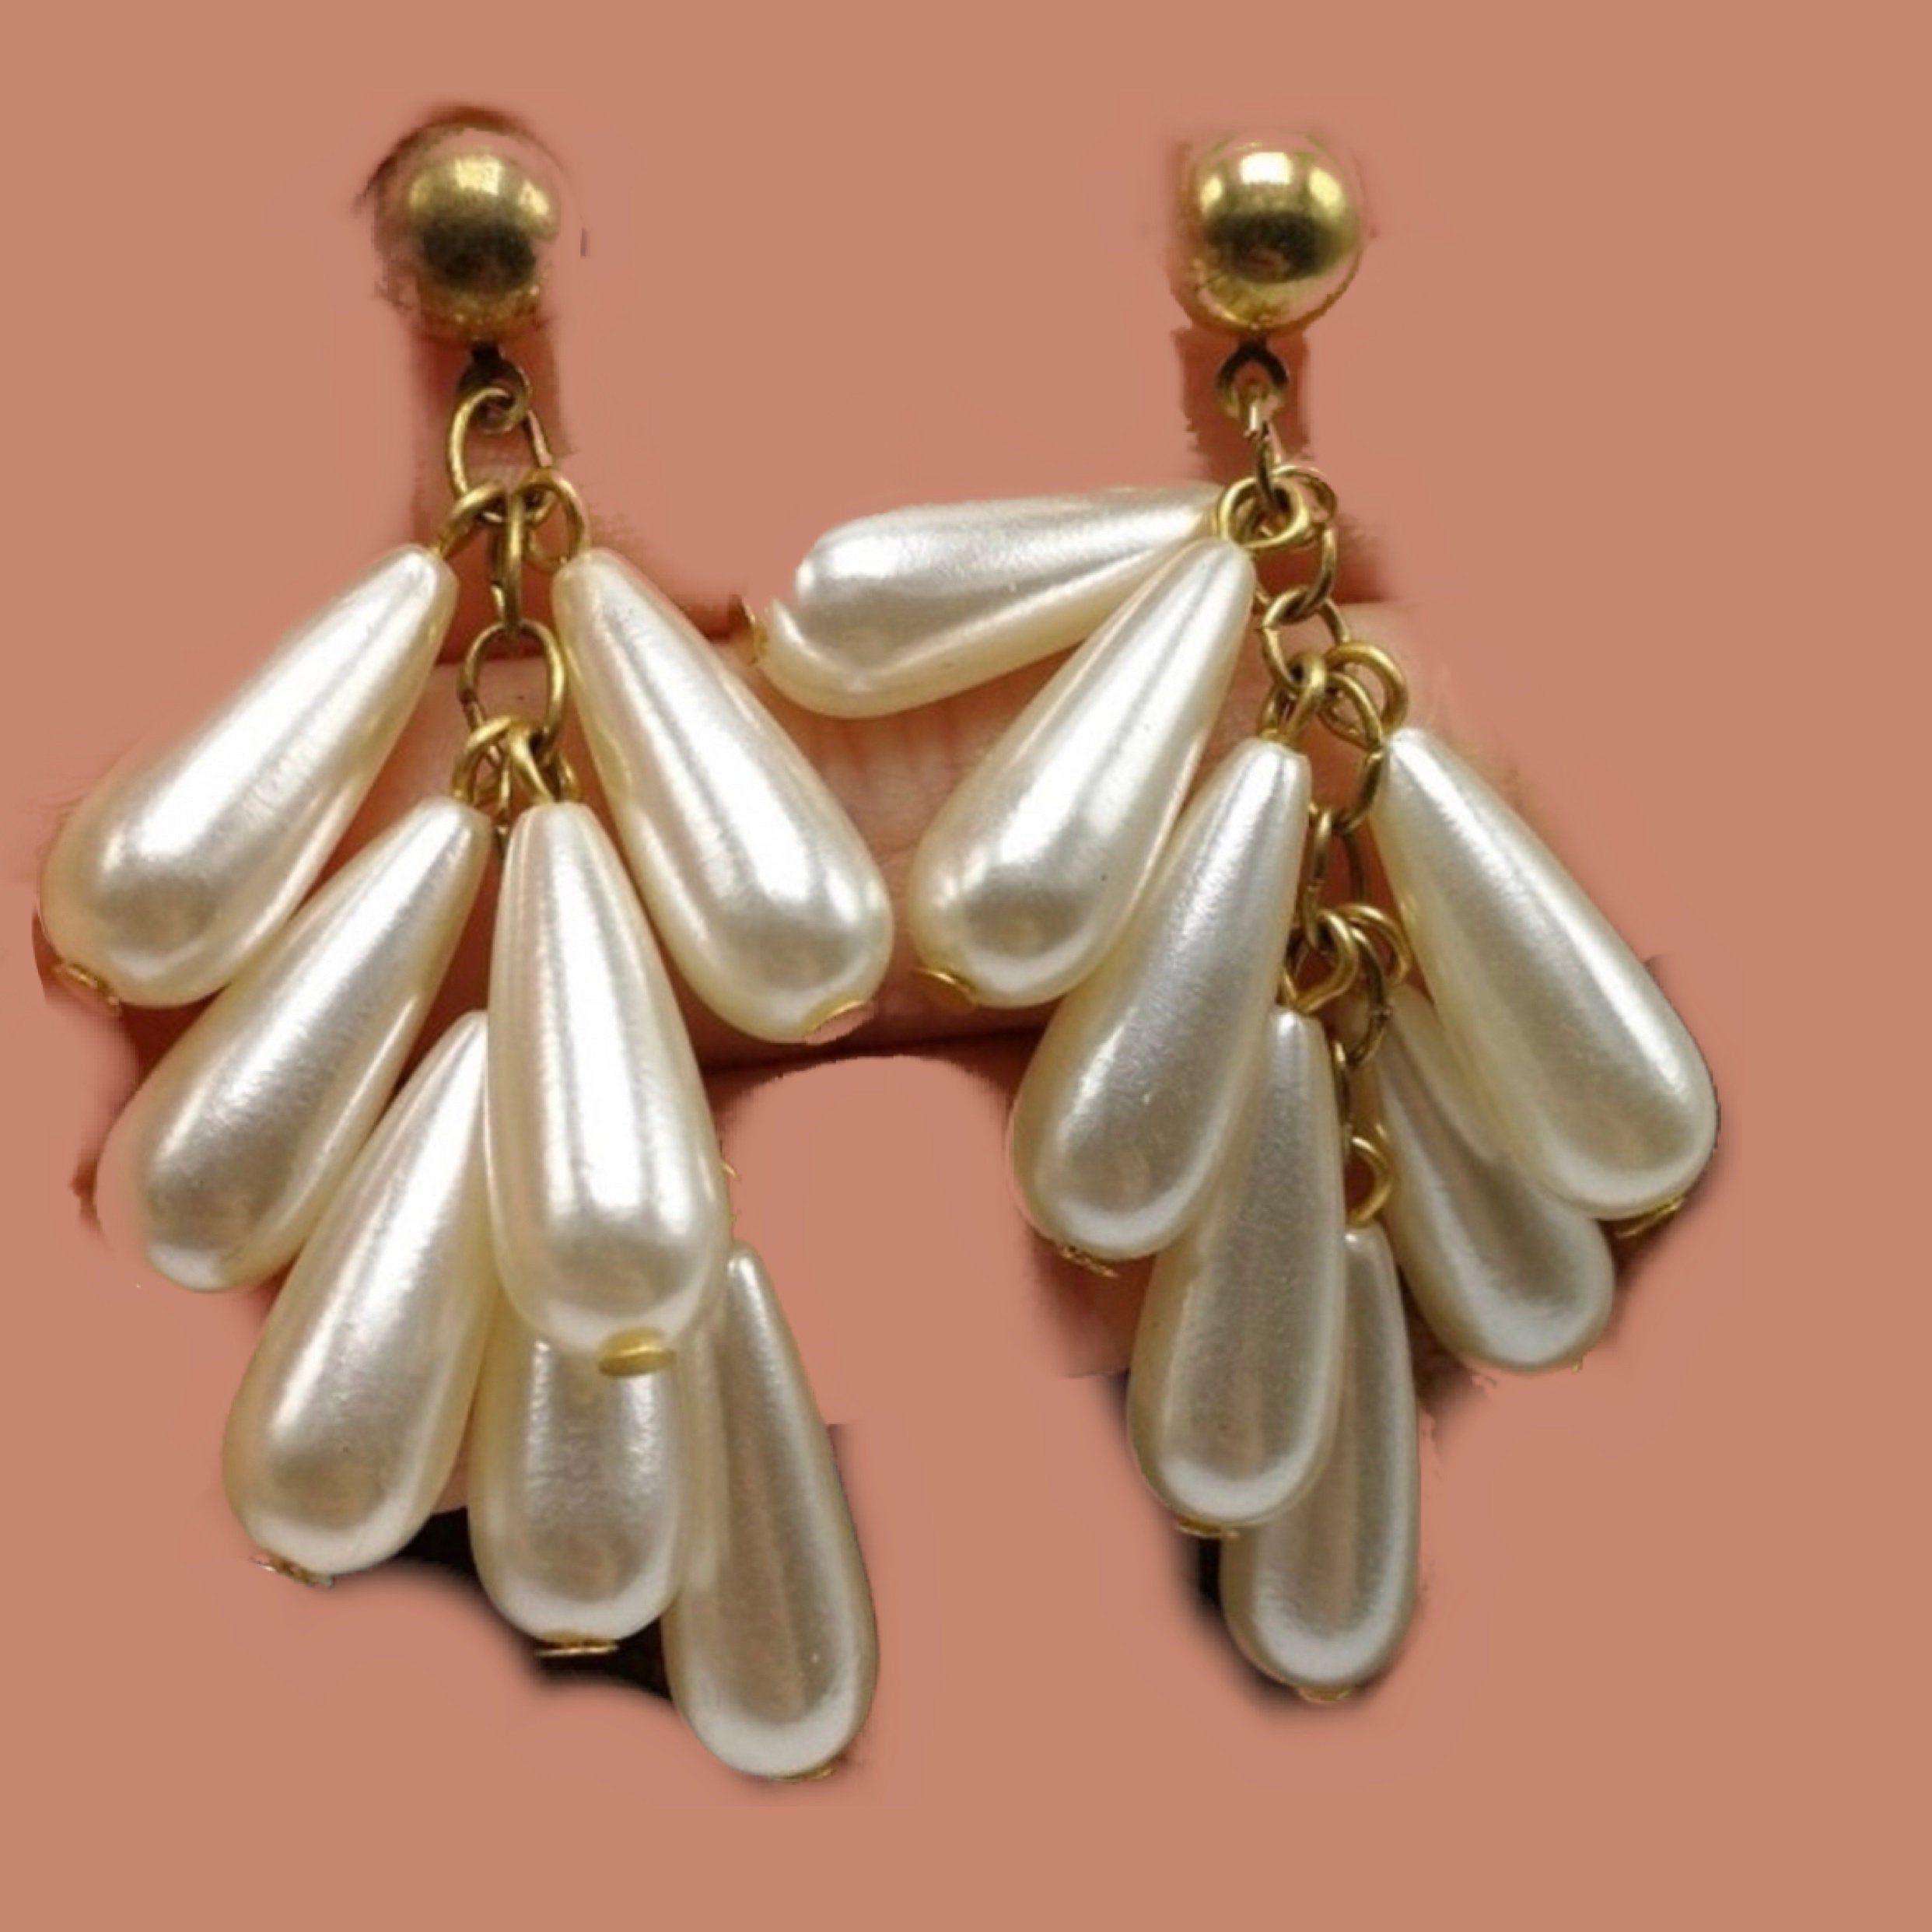 Vintage Pearl Teardrop Tassel Dangles Now Trending 90s Glamour Jewelry Statement Earrings